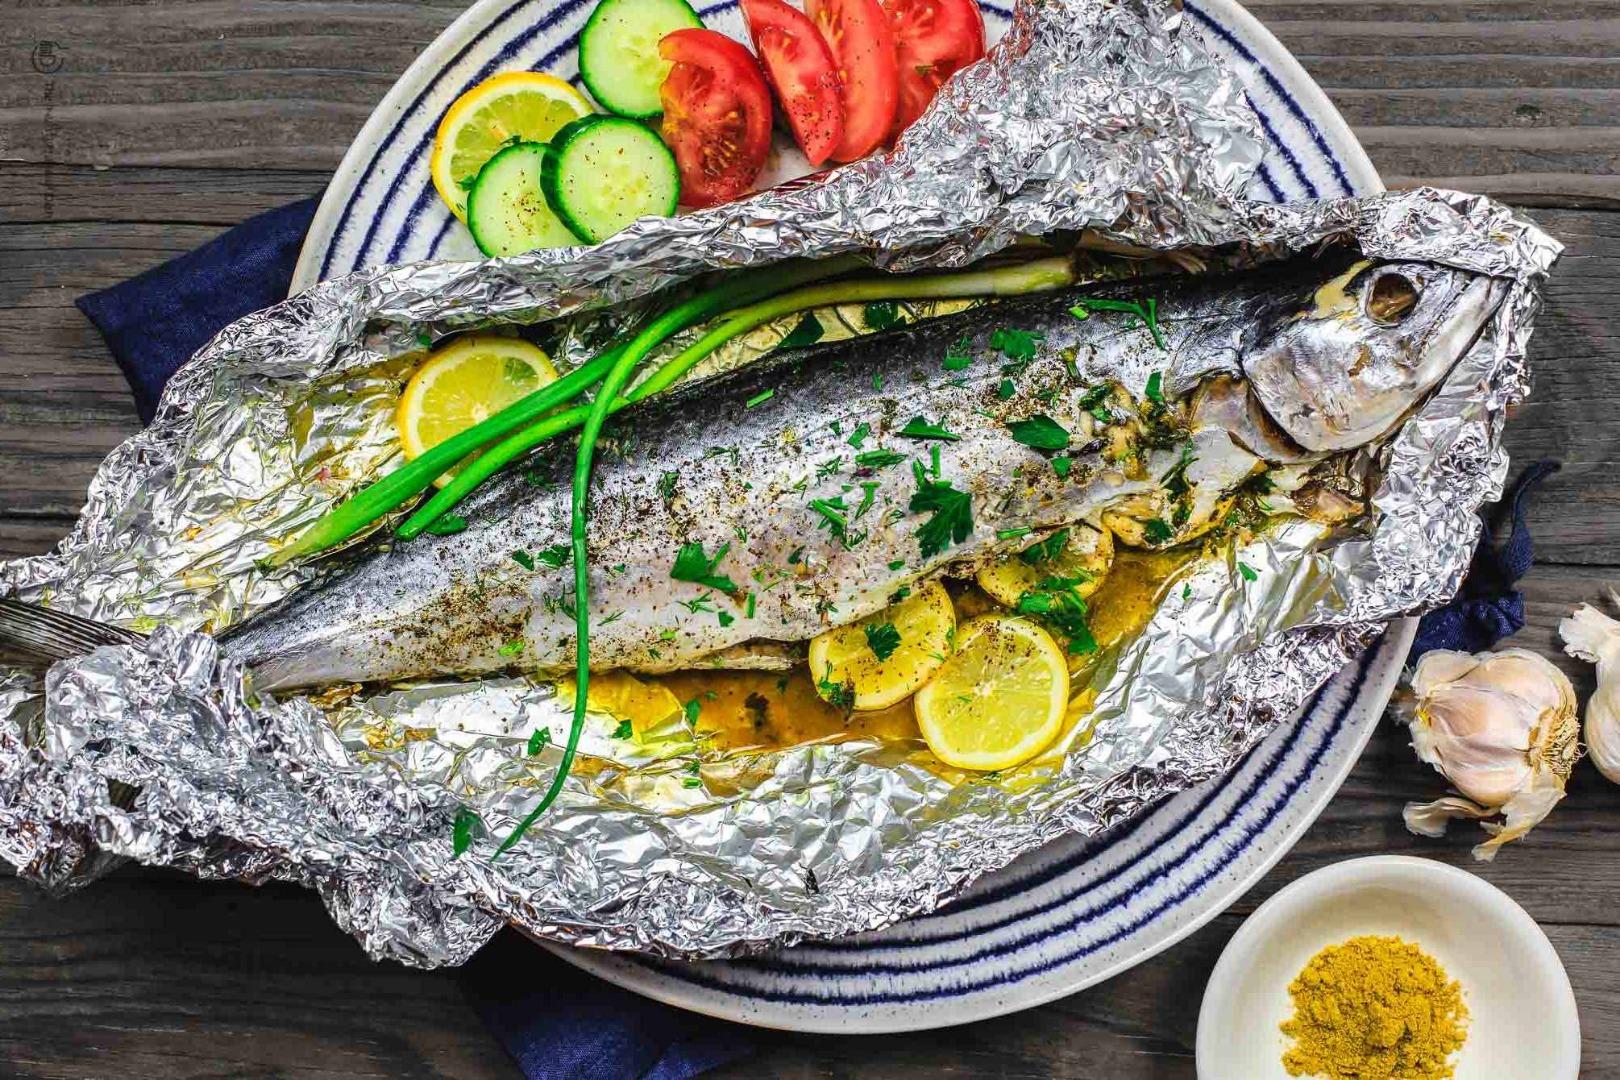 Macrou la cuptor în stil mediteranean